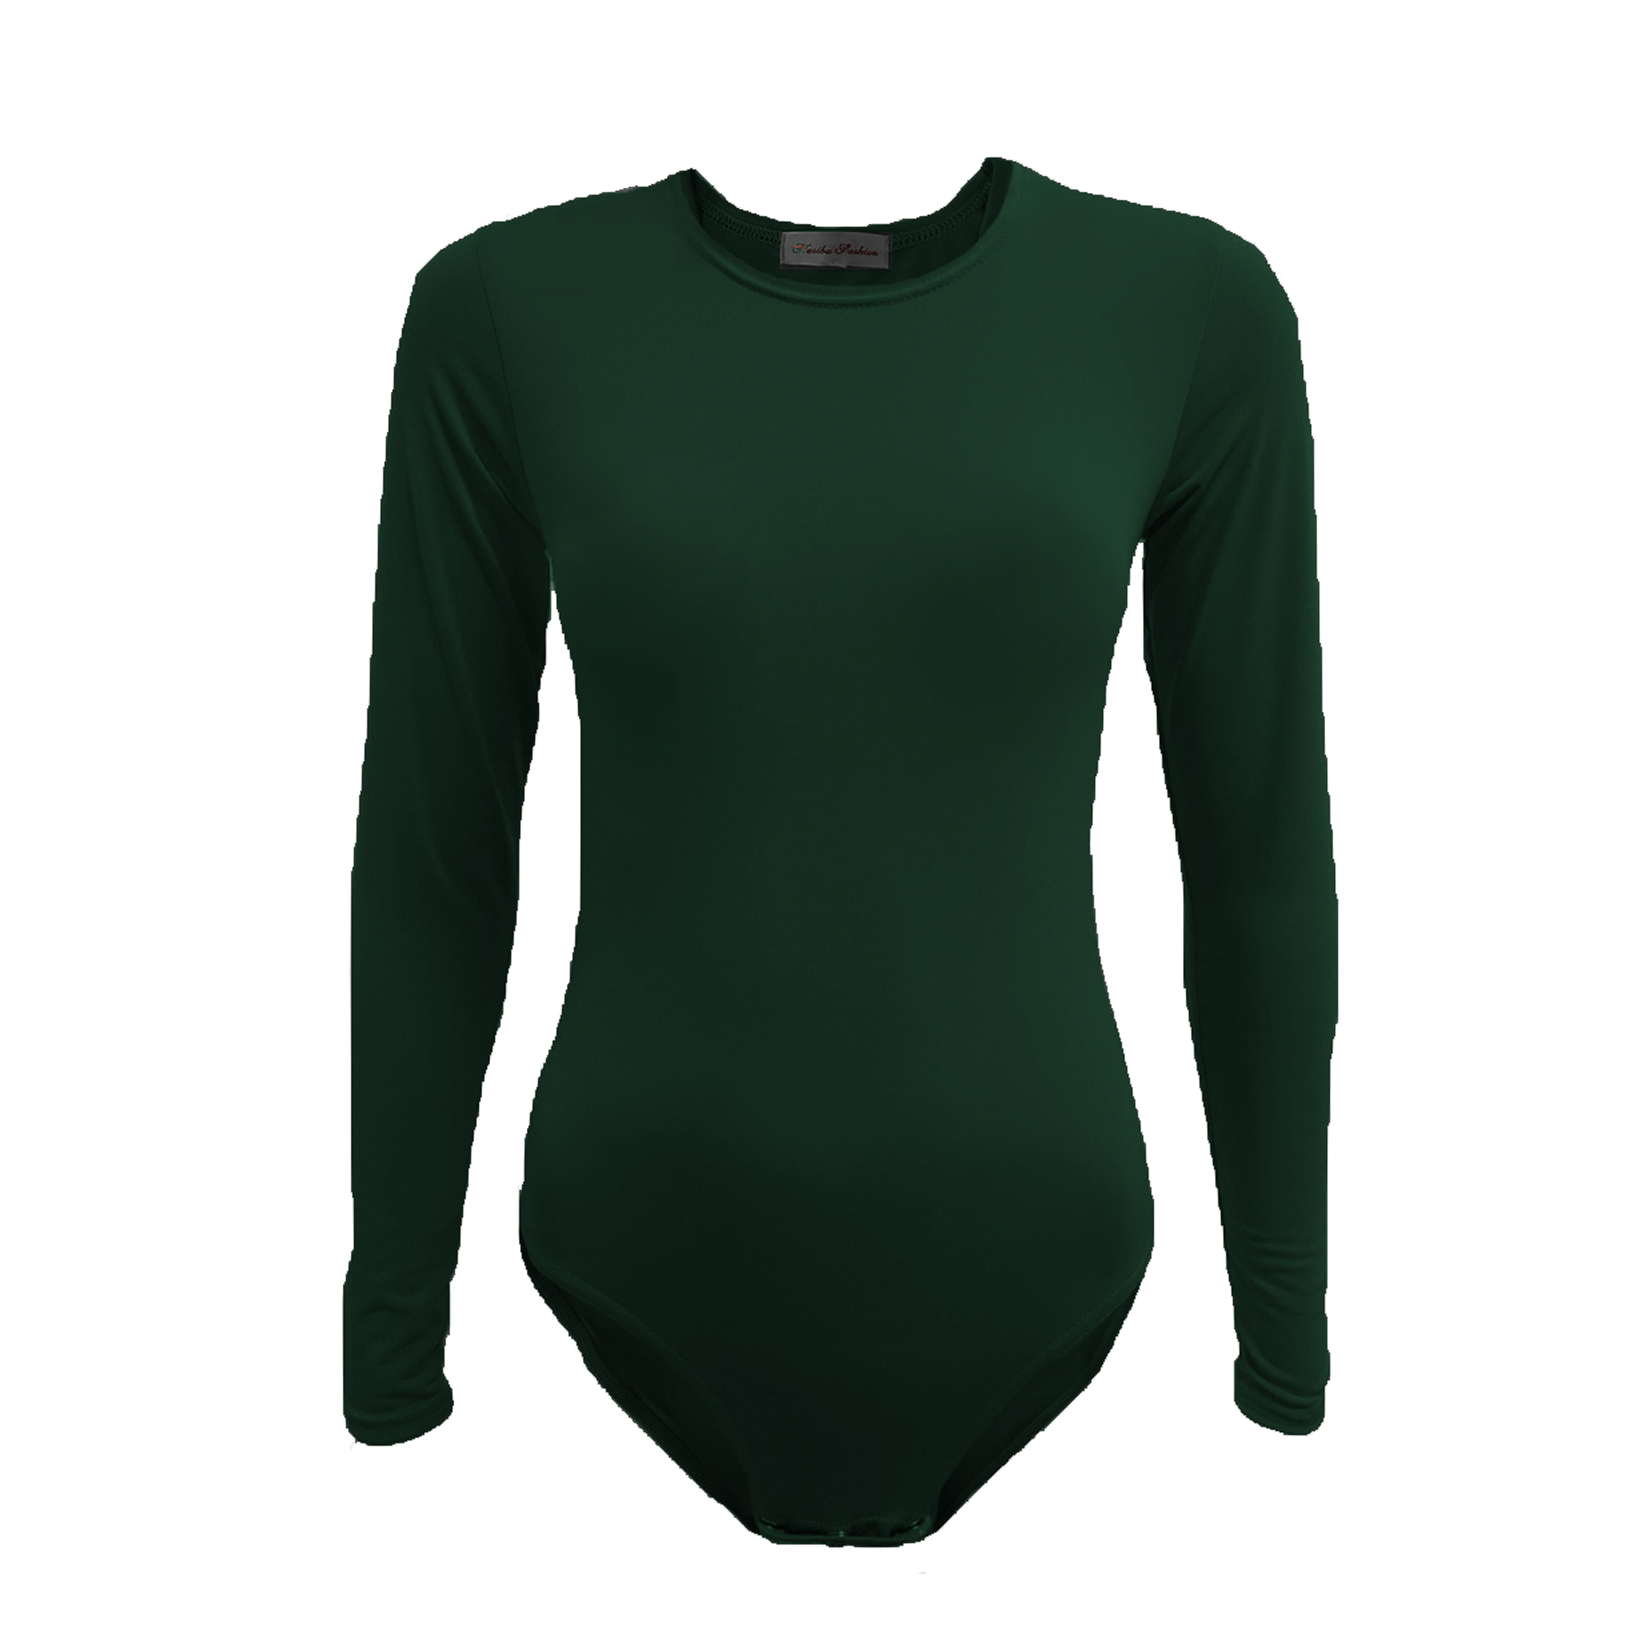 Nasiba Fashion Bottle Green Bodysuit